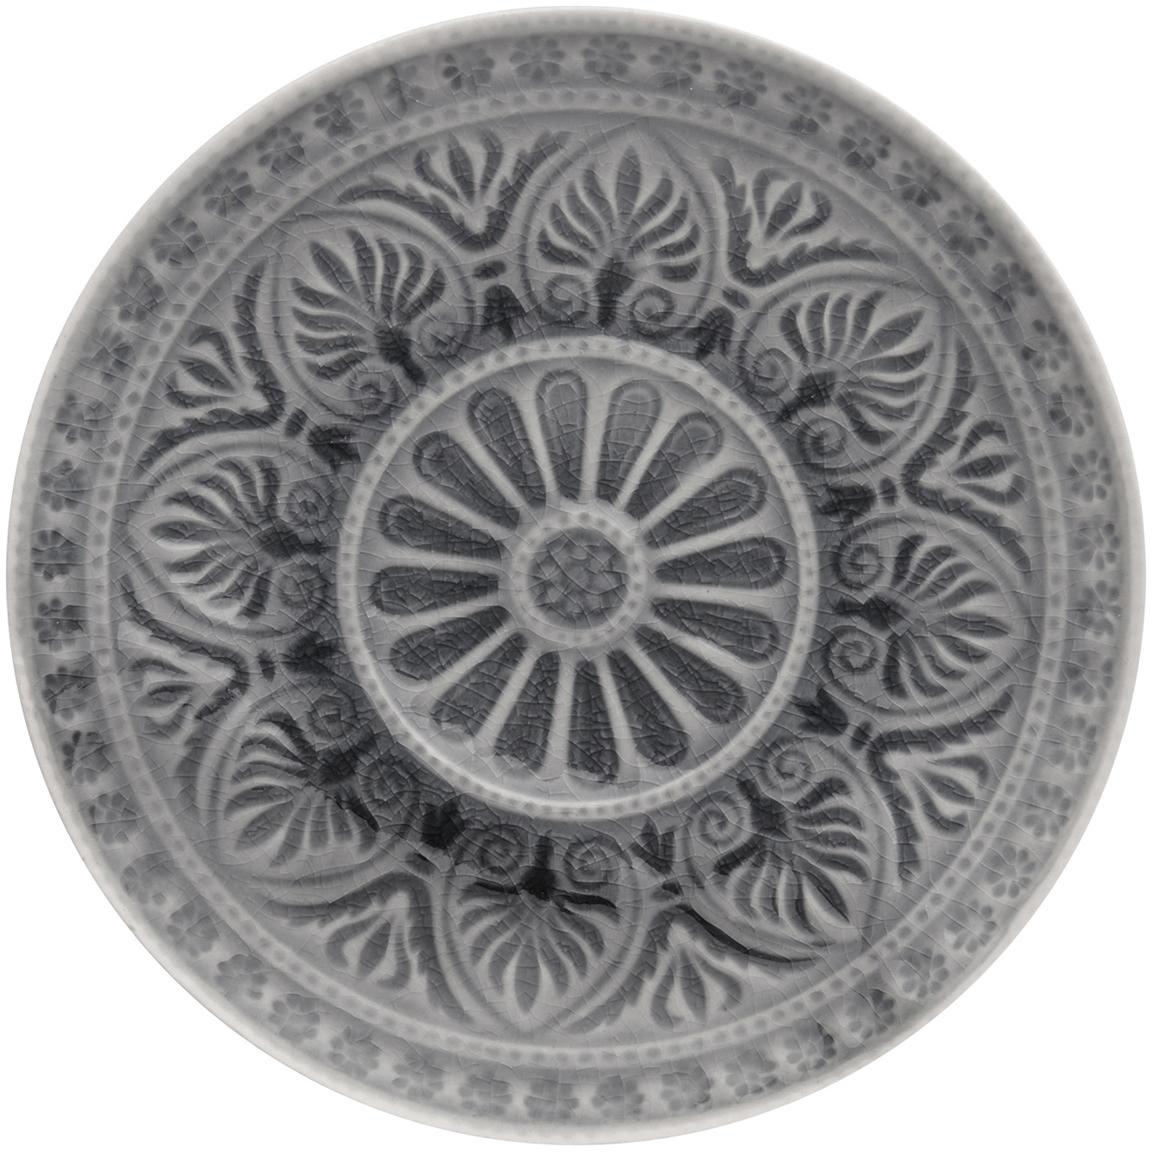 Handbemalte Brotteller Sumatra in Grau, 2 Stück, Steingut, Grau, Ø 14 x H 2 cm